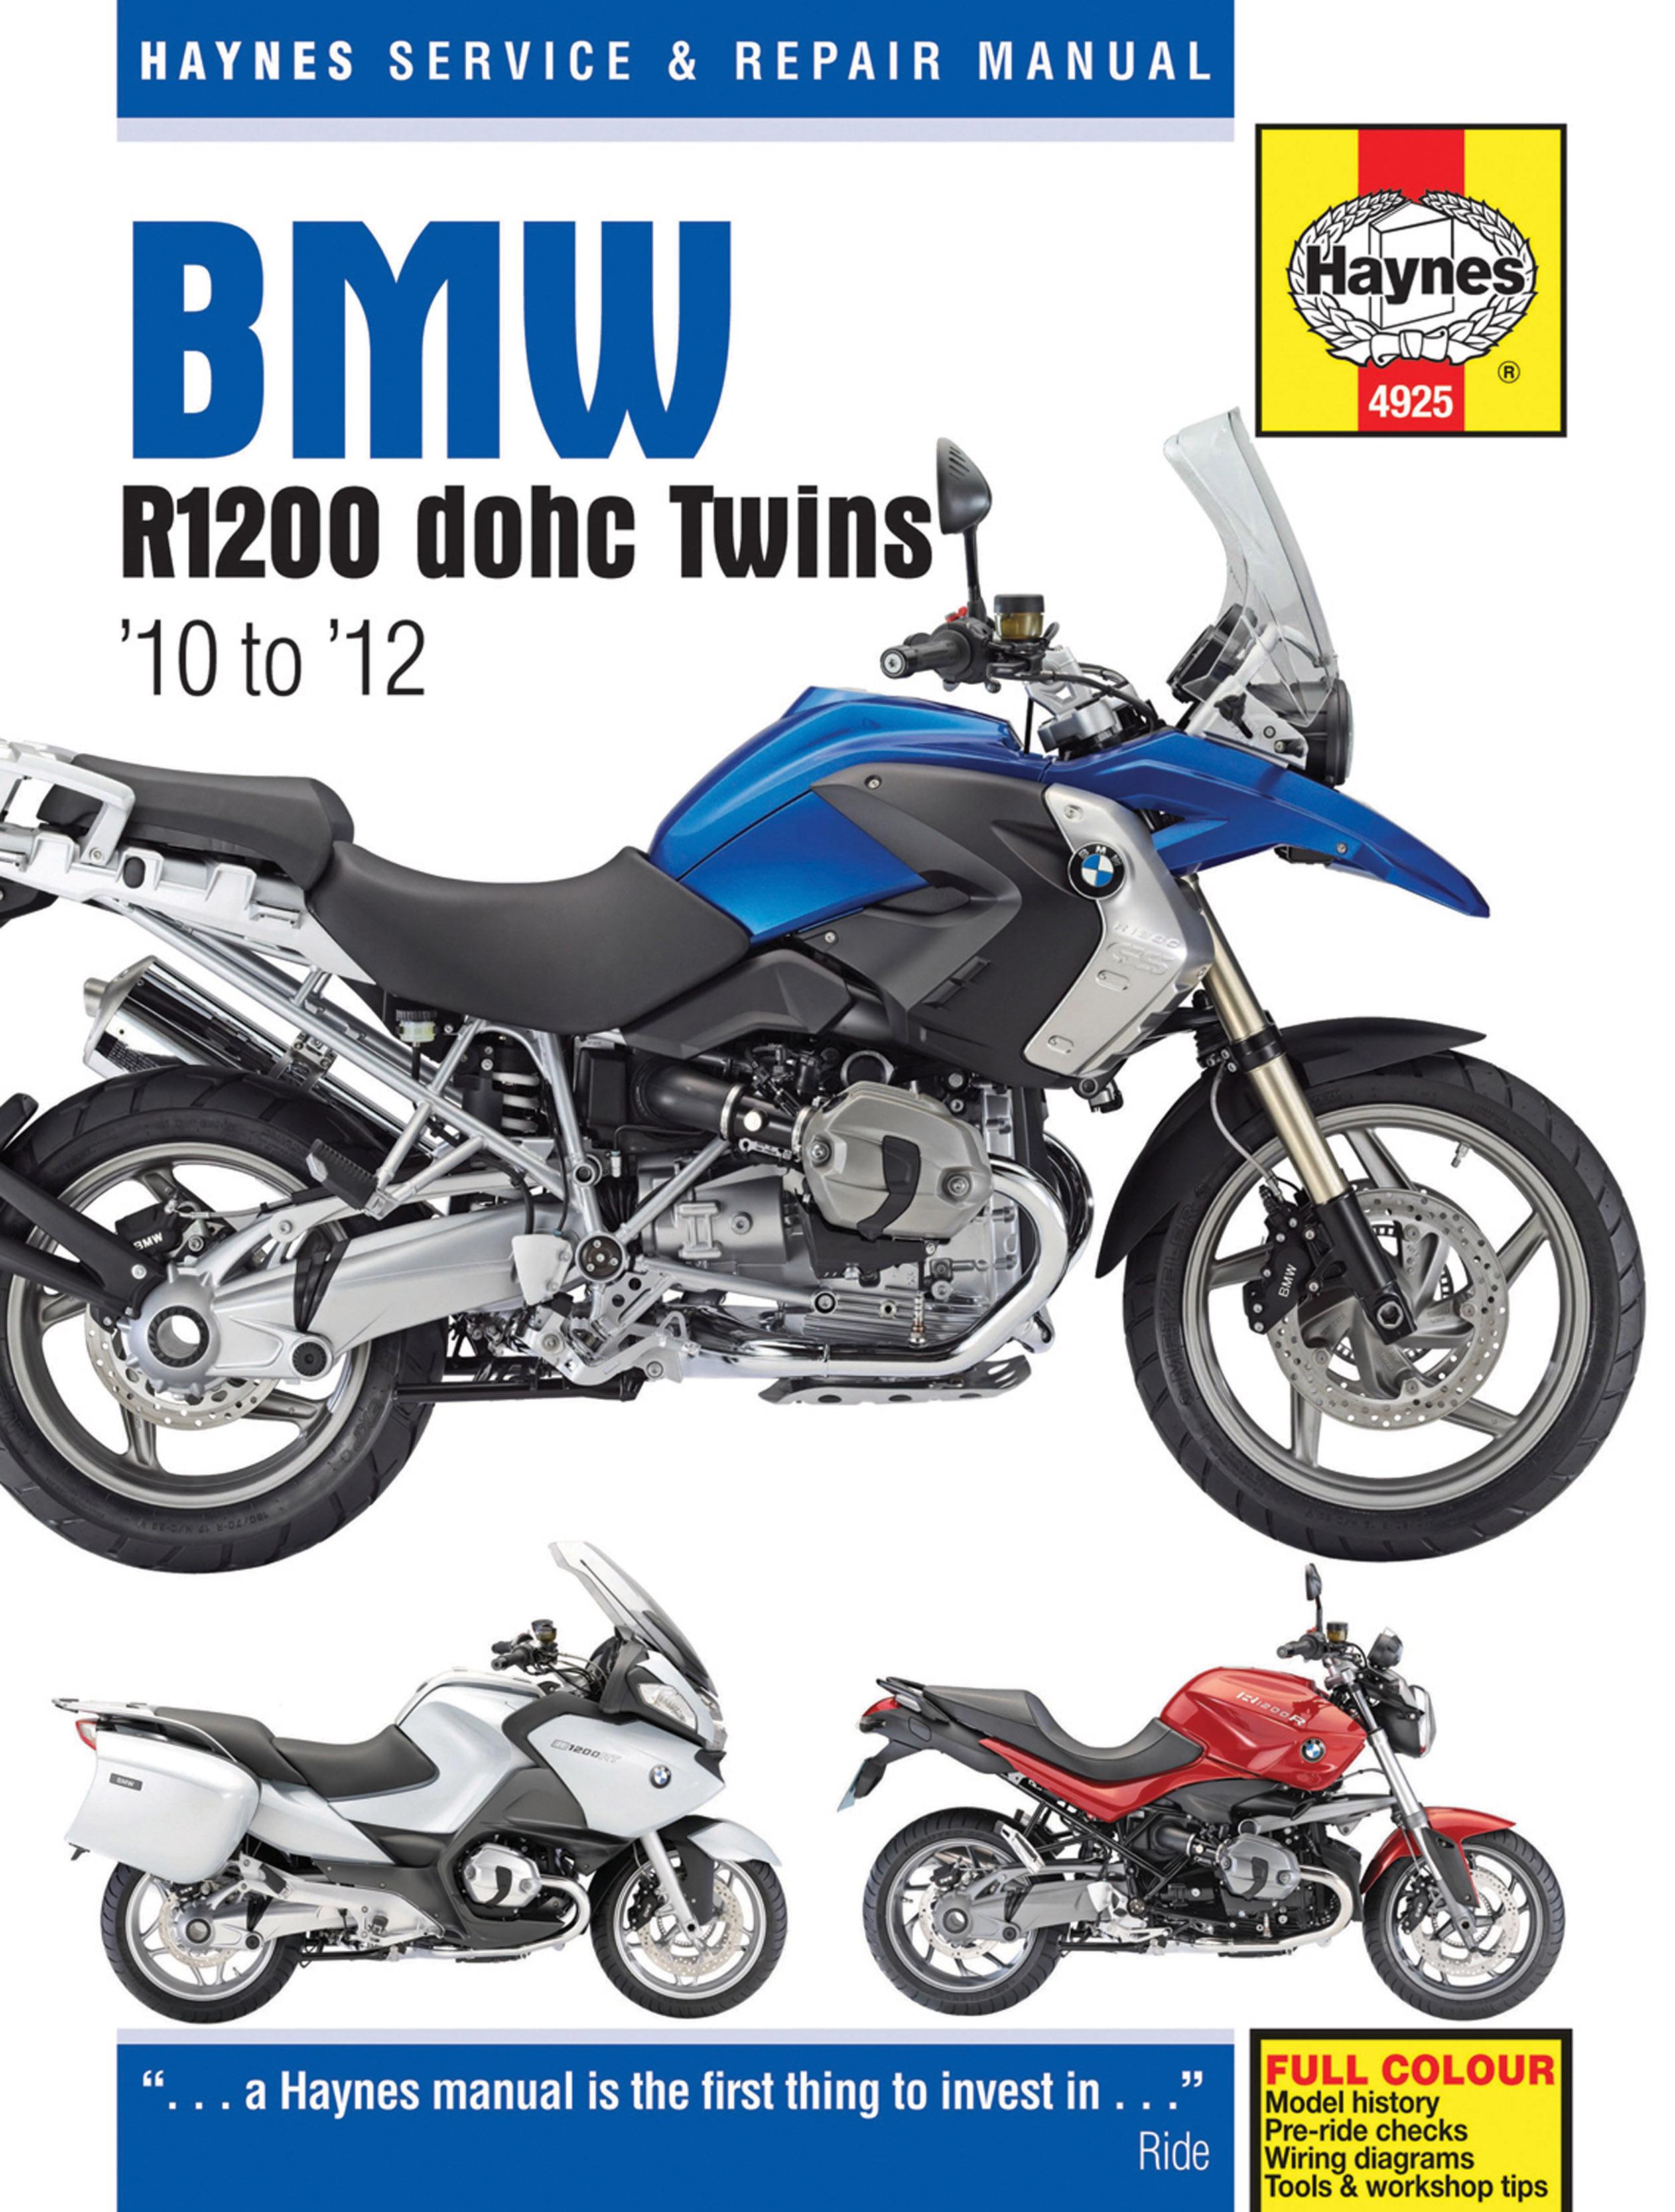 BMW R1200 dohc Twins 10 12 Haynes Repair Manual